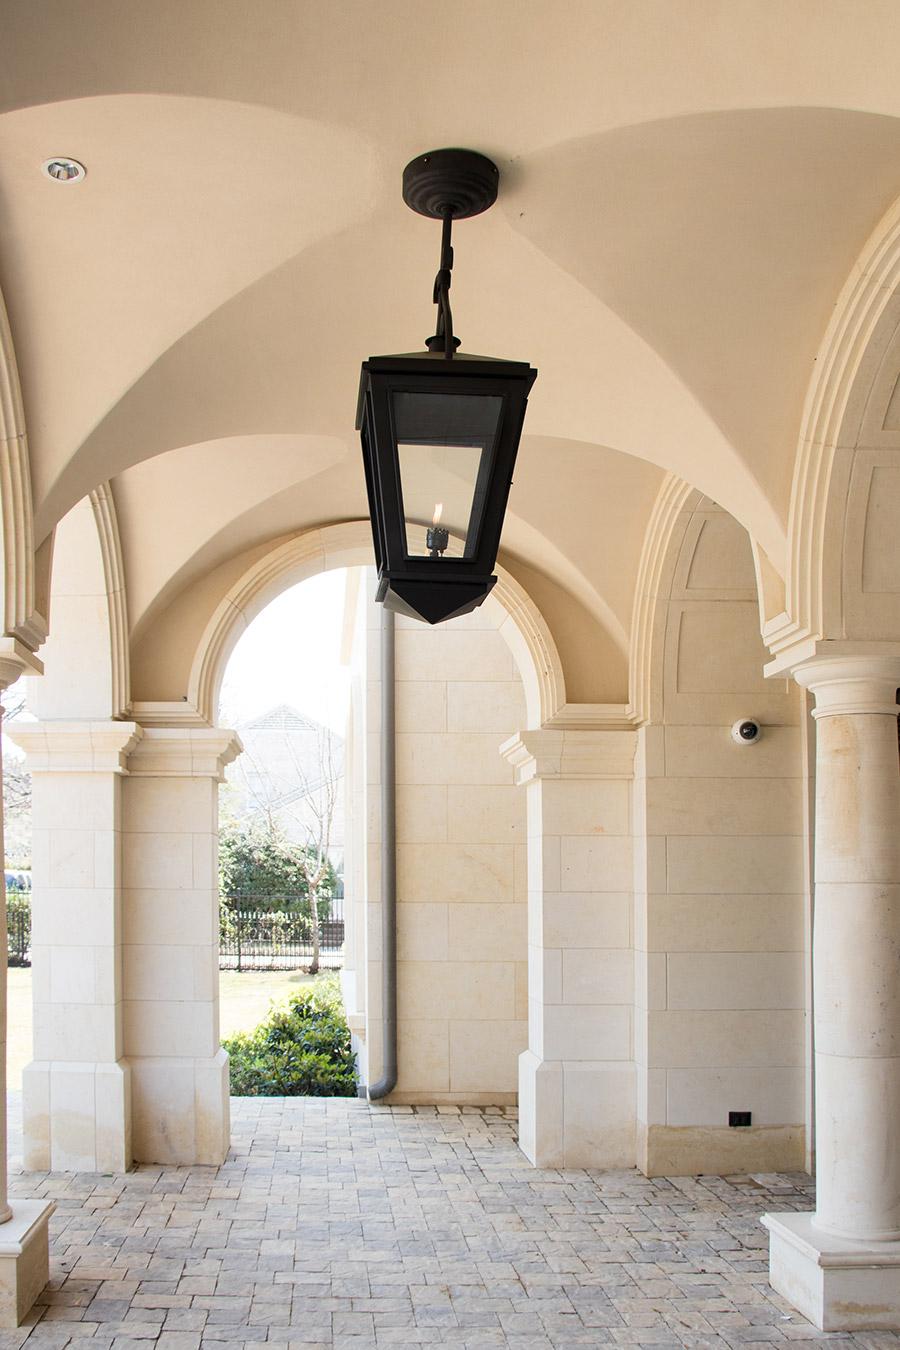 Deloache-Residence-classic-steel-outdoor-lighting-architectural-doors-railing-winnecellar-(13)